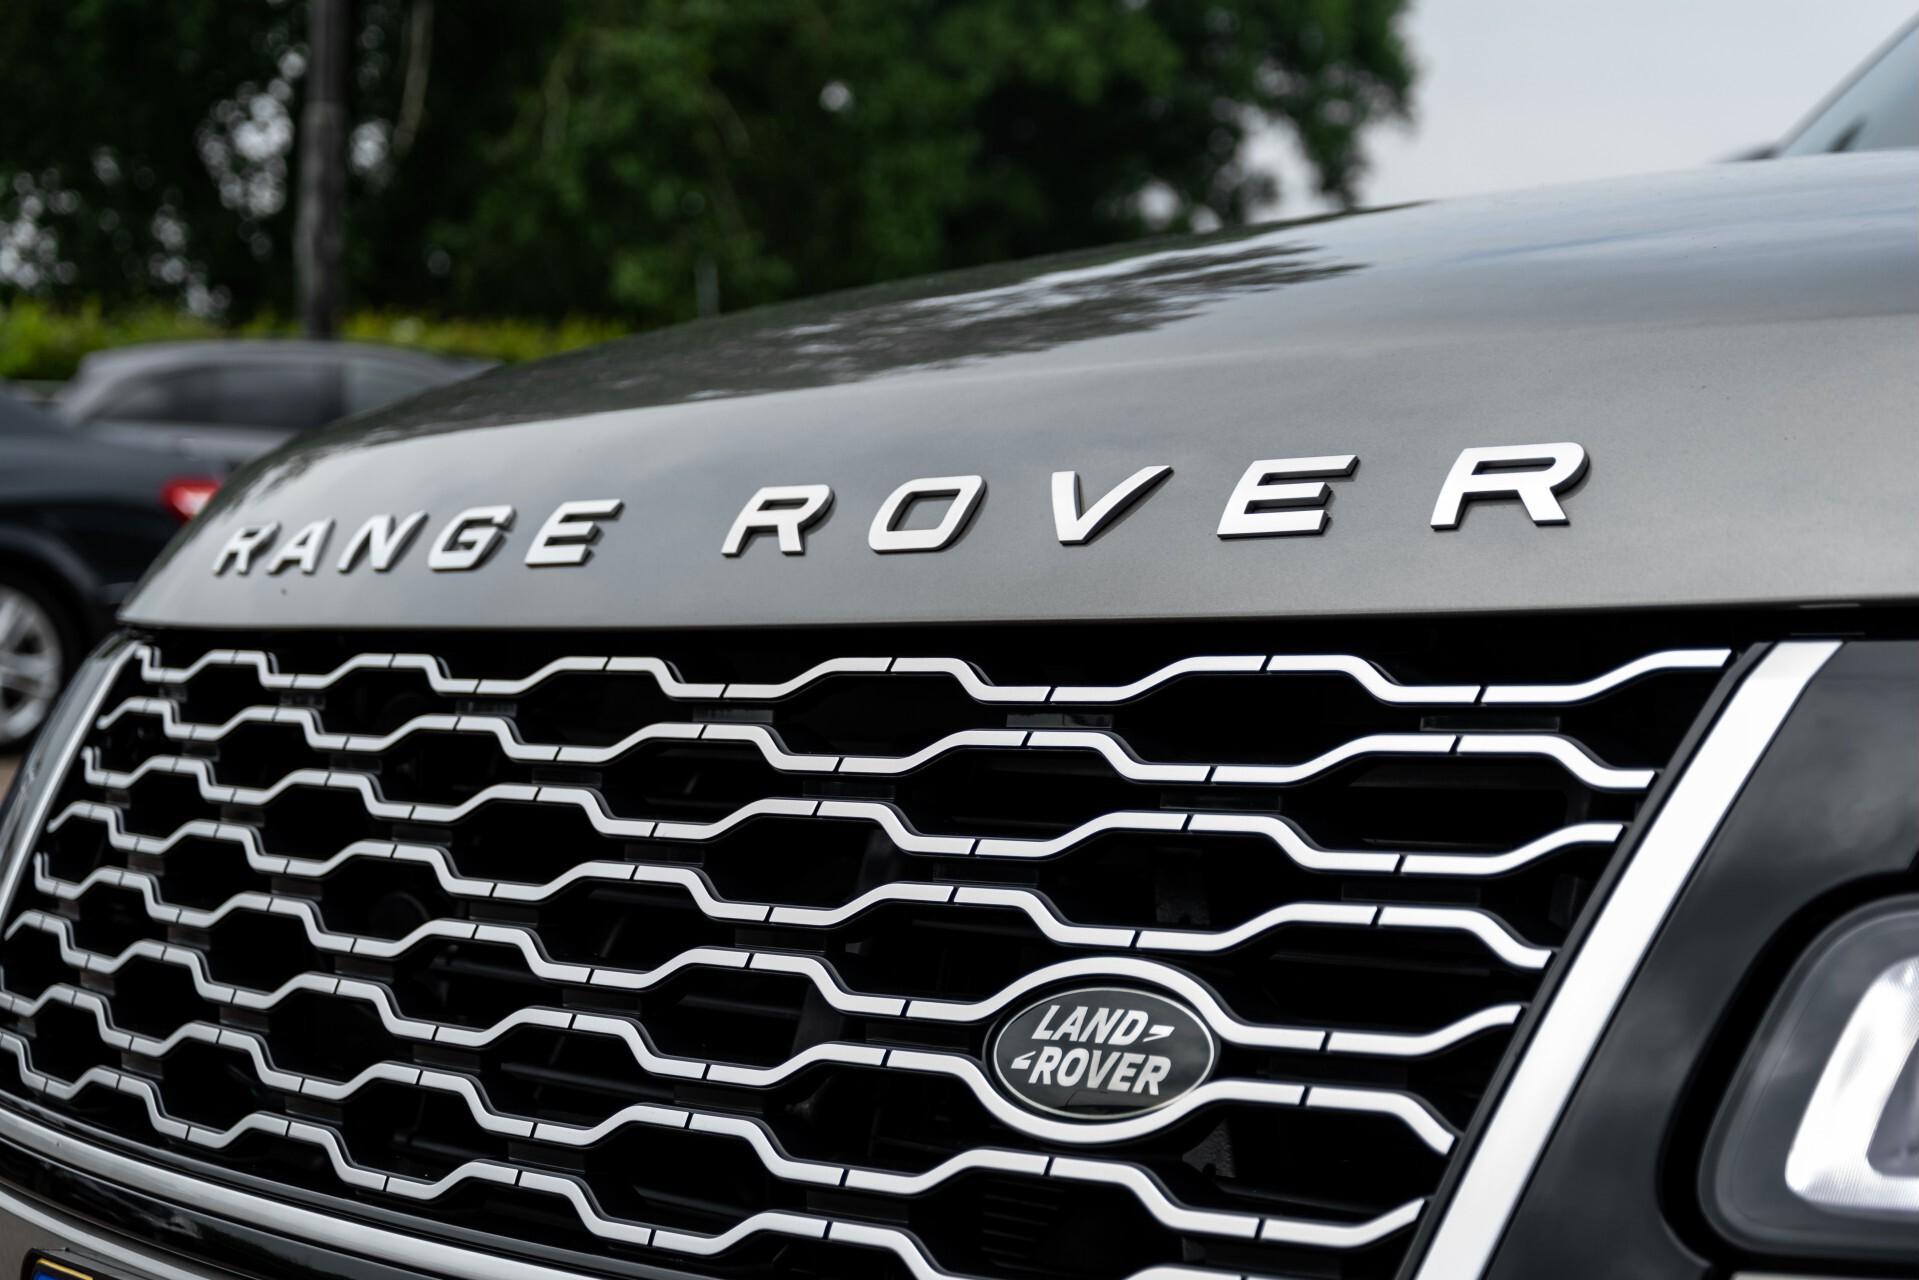 Land Rover Range Rover 3.0 P400 MHEV LWB Autobiography Aut8 Foto 65